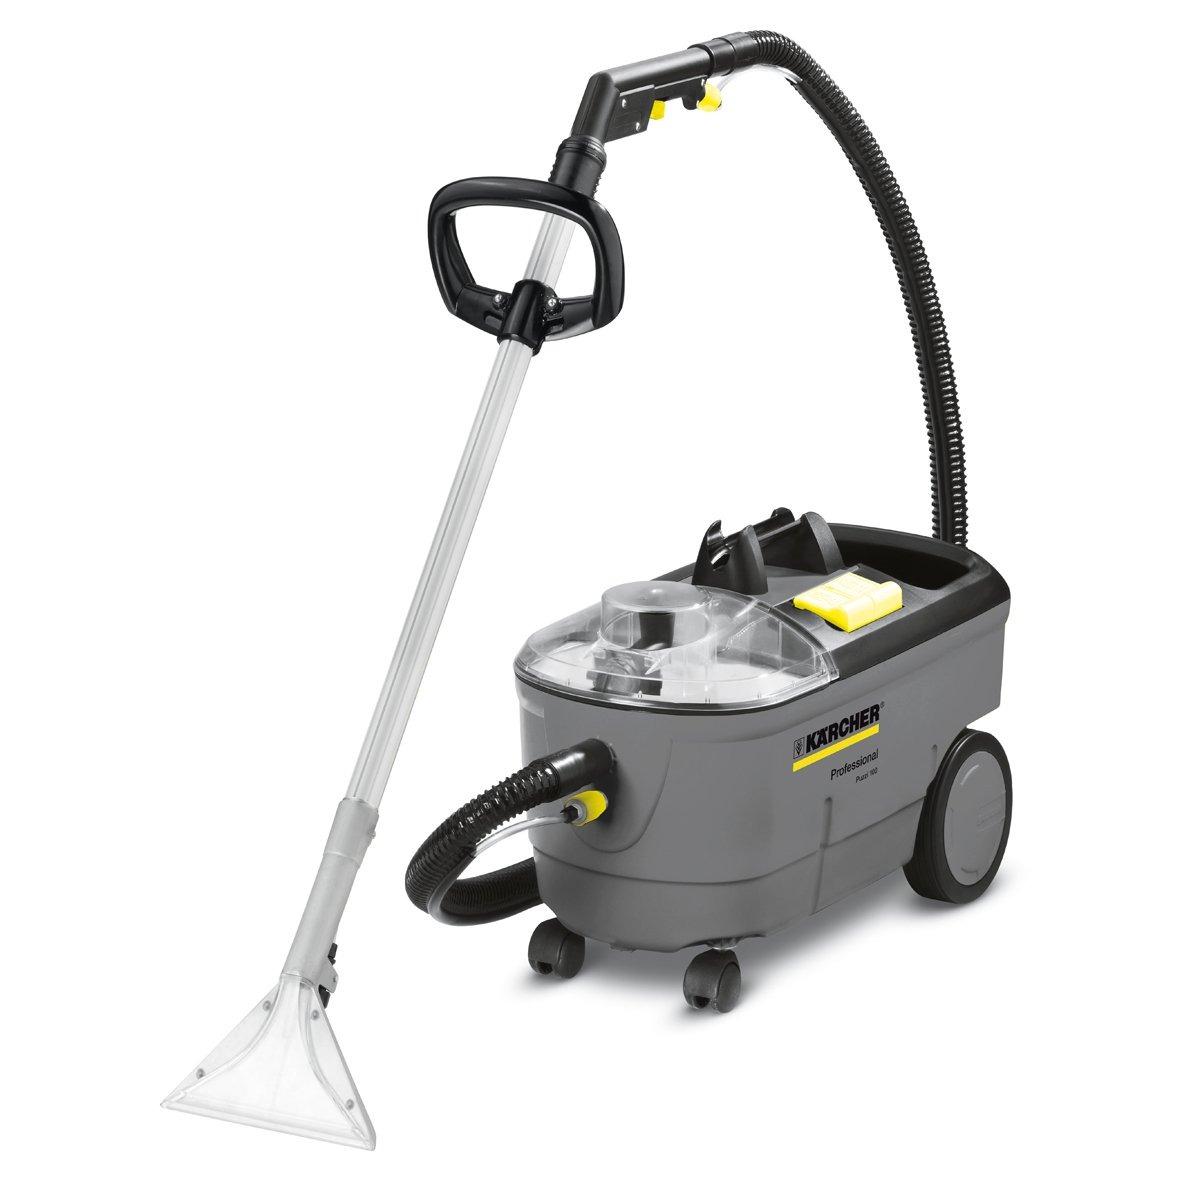 Kärcher Puzzi 100 Spray-Extraction Cleaner 240v 10.3Kg